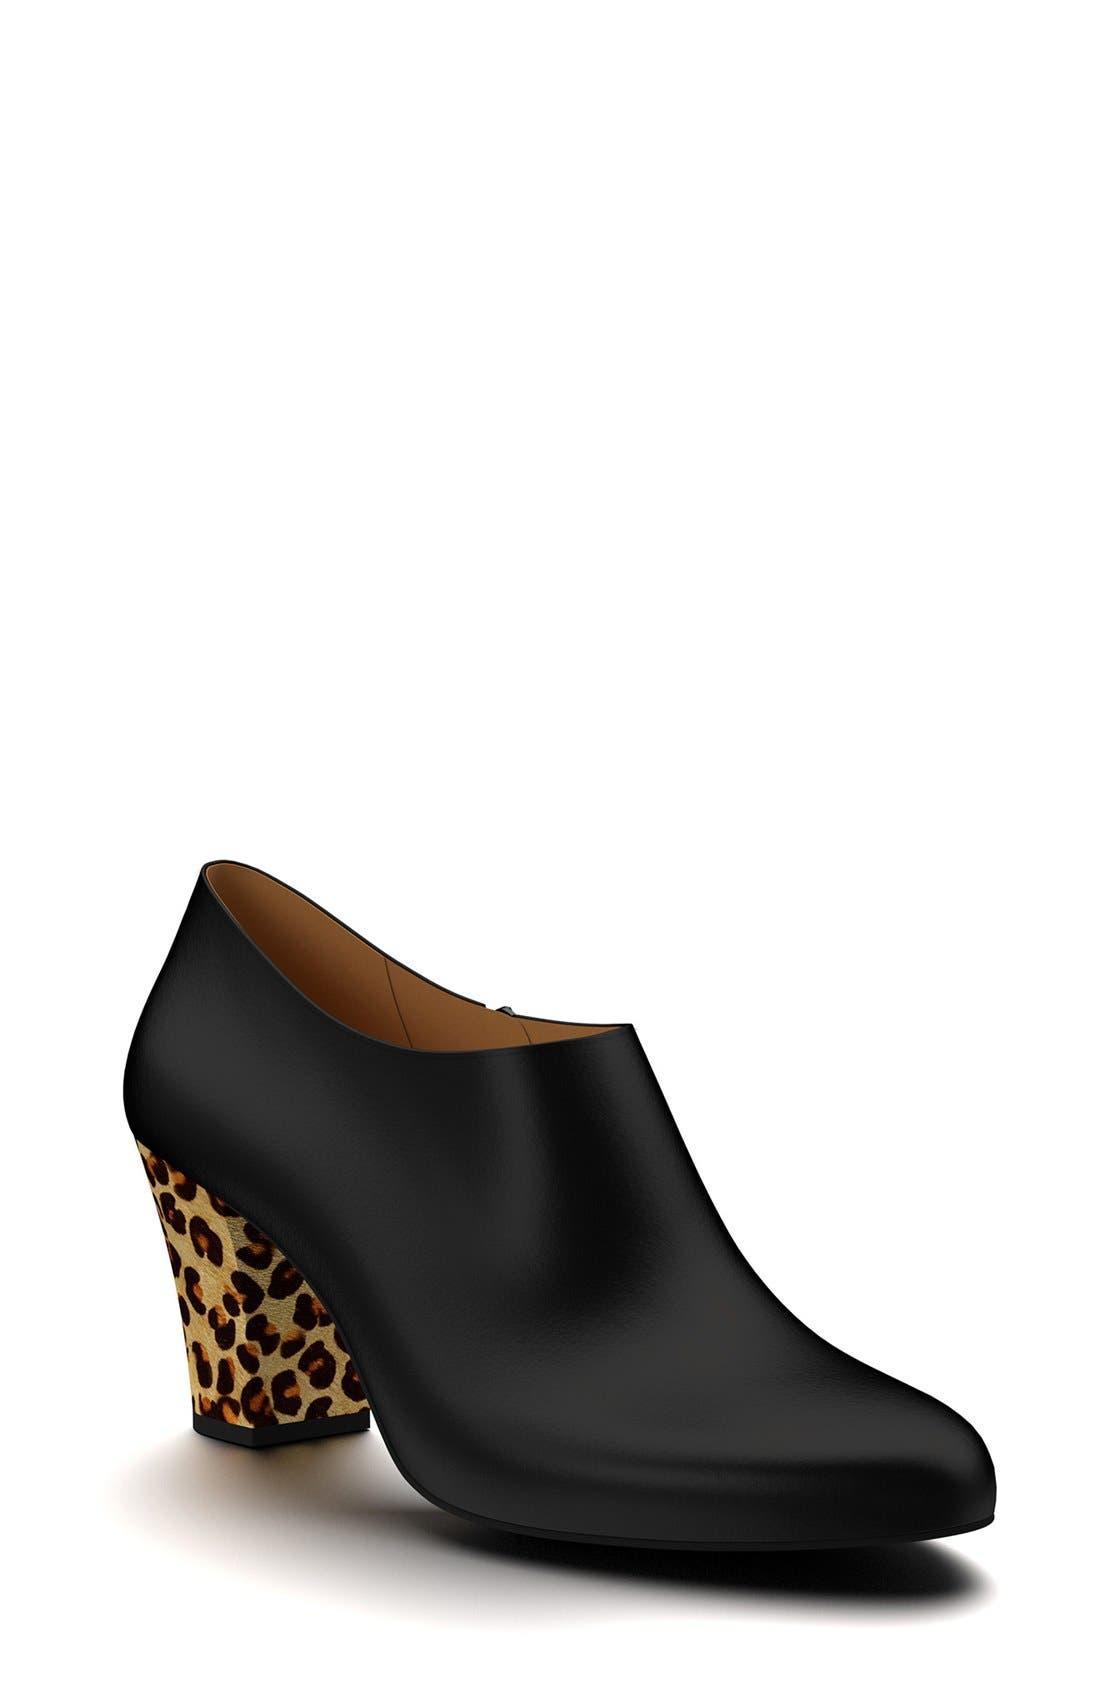 Alternate Image 1 Selected - Shoes of Prey & Genuine Calf Hair  Bootie (Women)